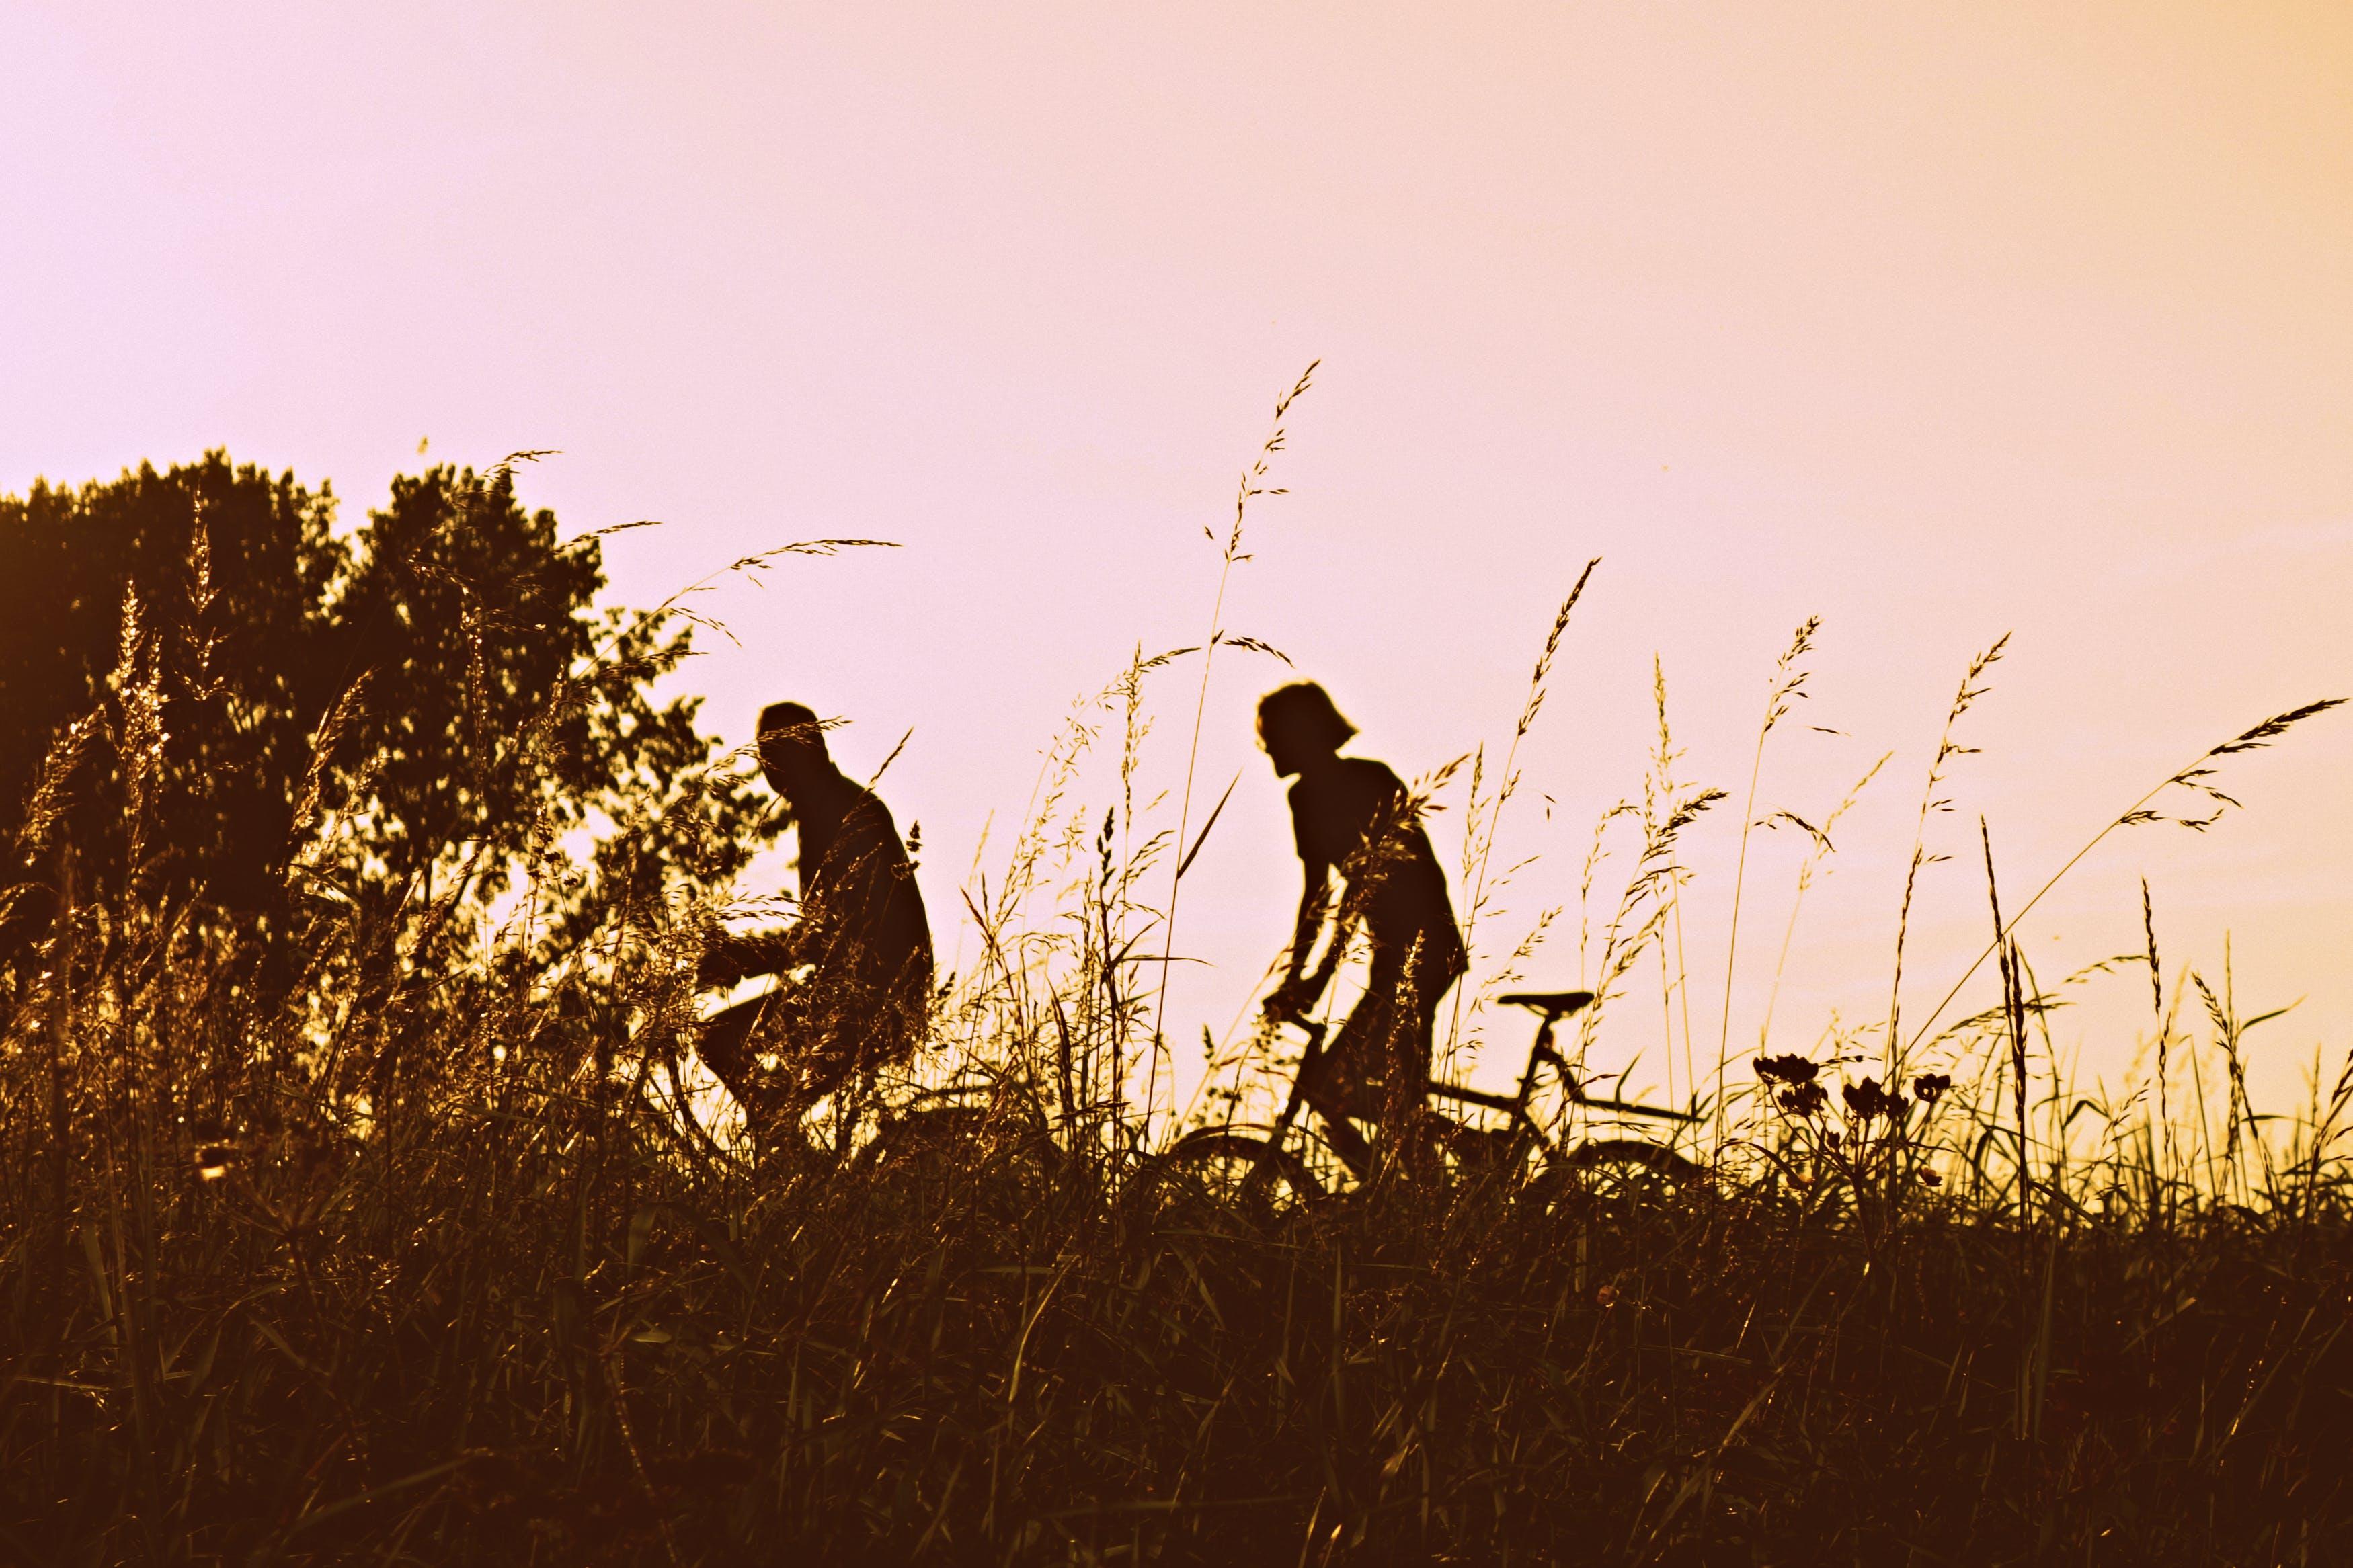 Free stock photo of nature, sunset, people, summer